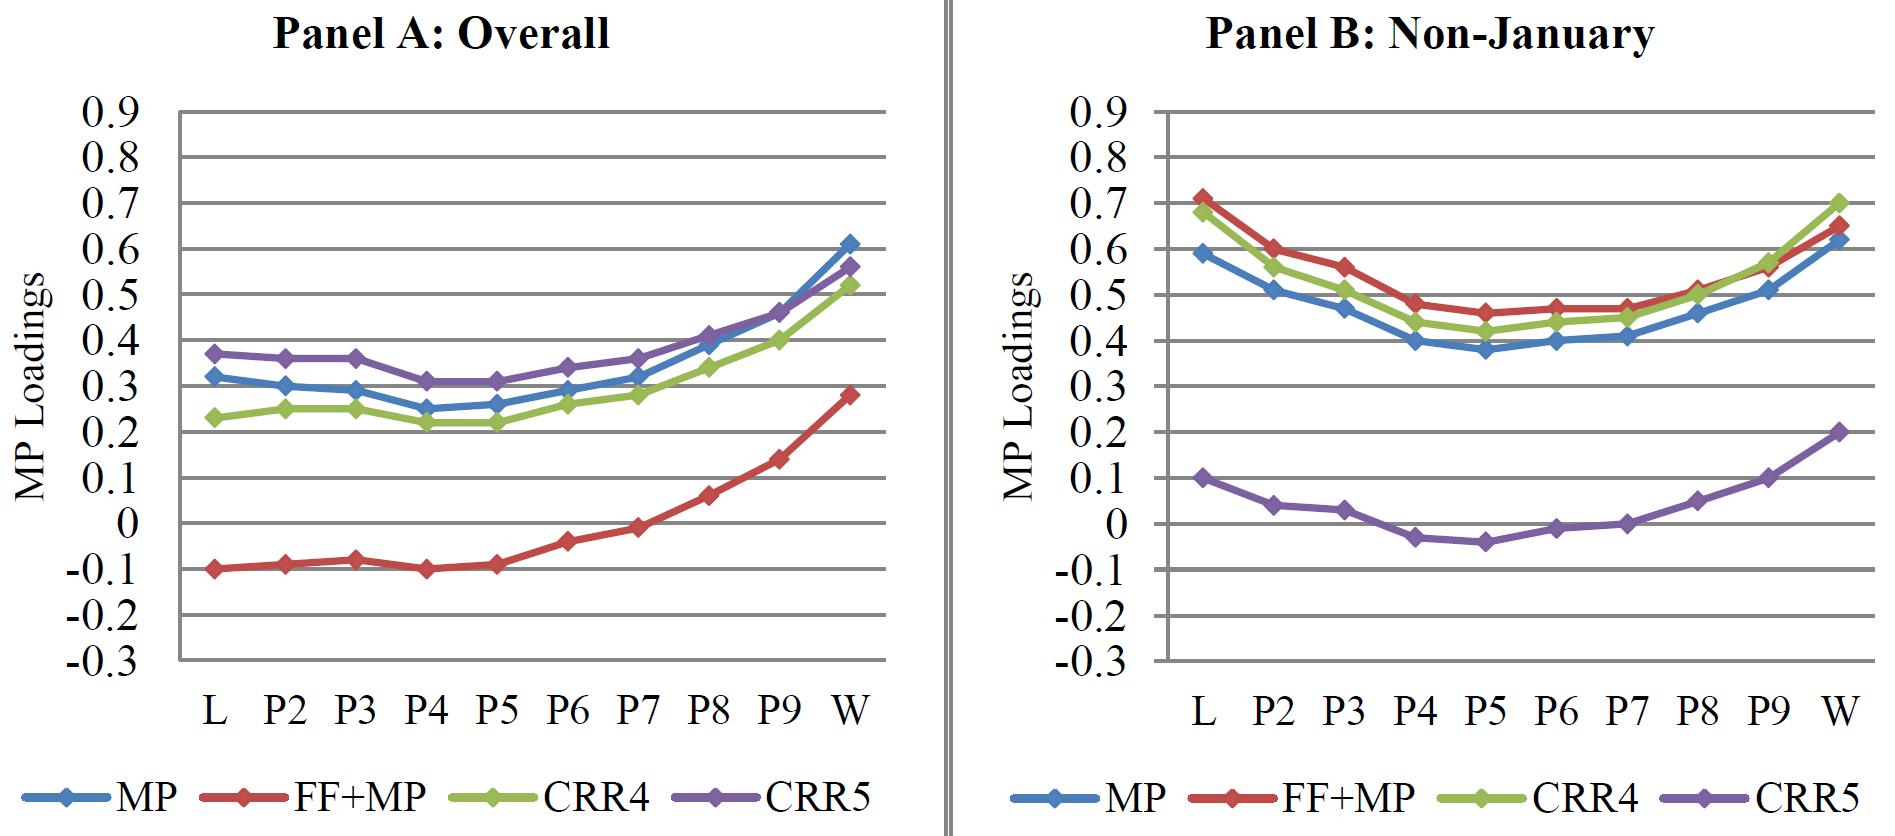 Makroökonomisches Risiko Wachstumsrate Industrieproduktion Momentum Zusammenhang